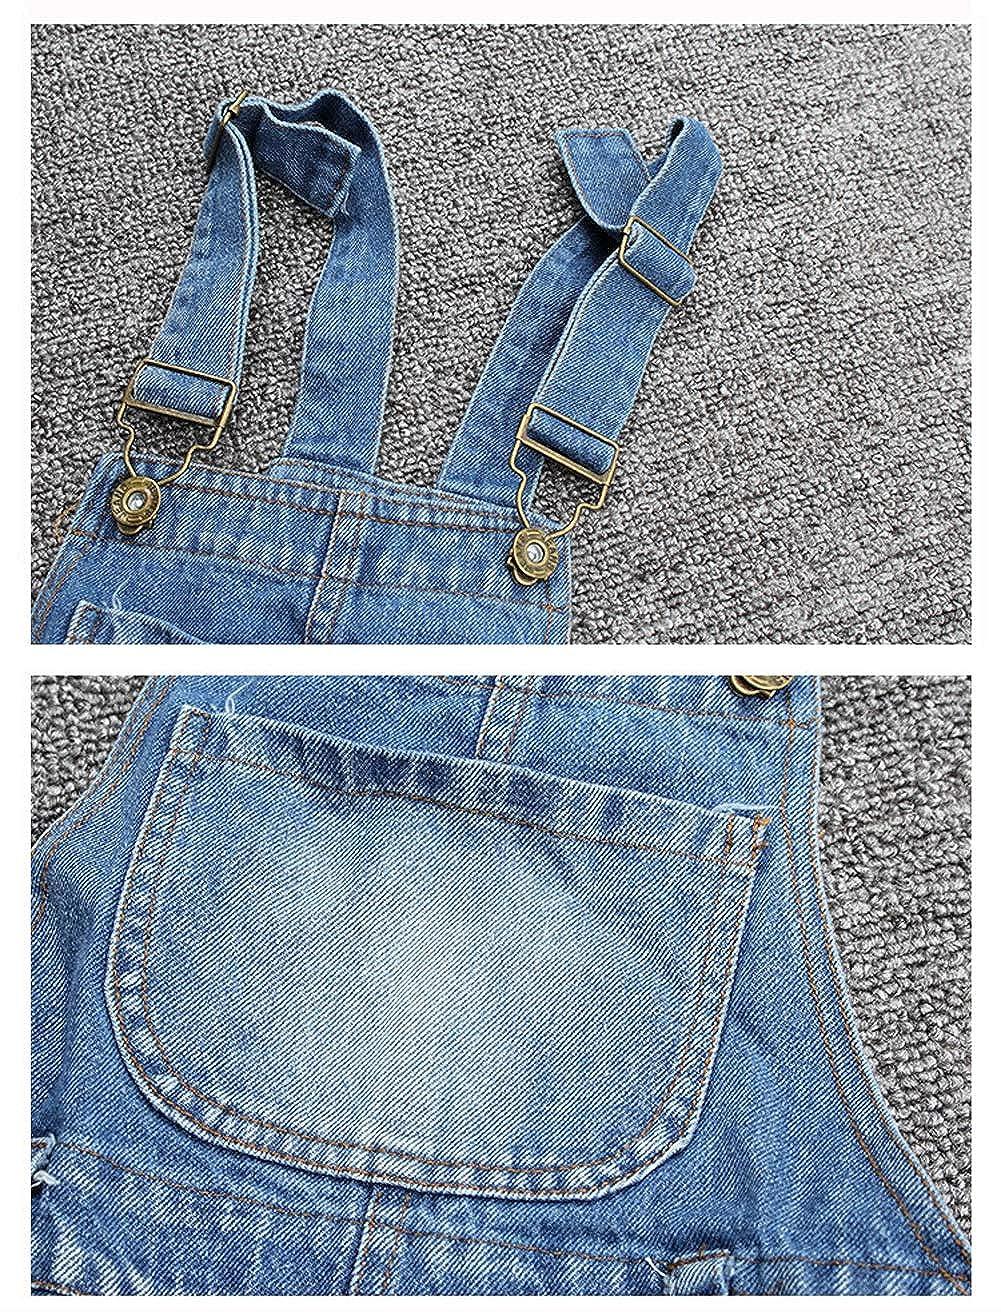 LAVIQK 3-13 Years Big Girls Kid Adjustable Strap Long Jeans Cotton Suspender Denim Bib Overalls Jumpsuit